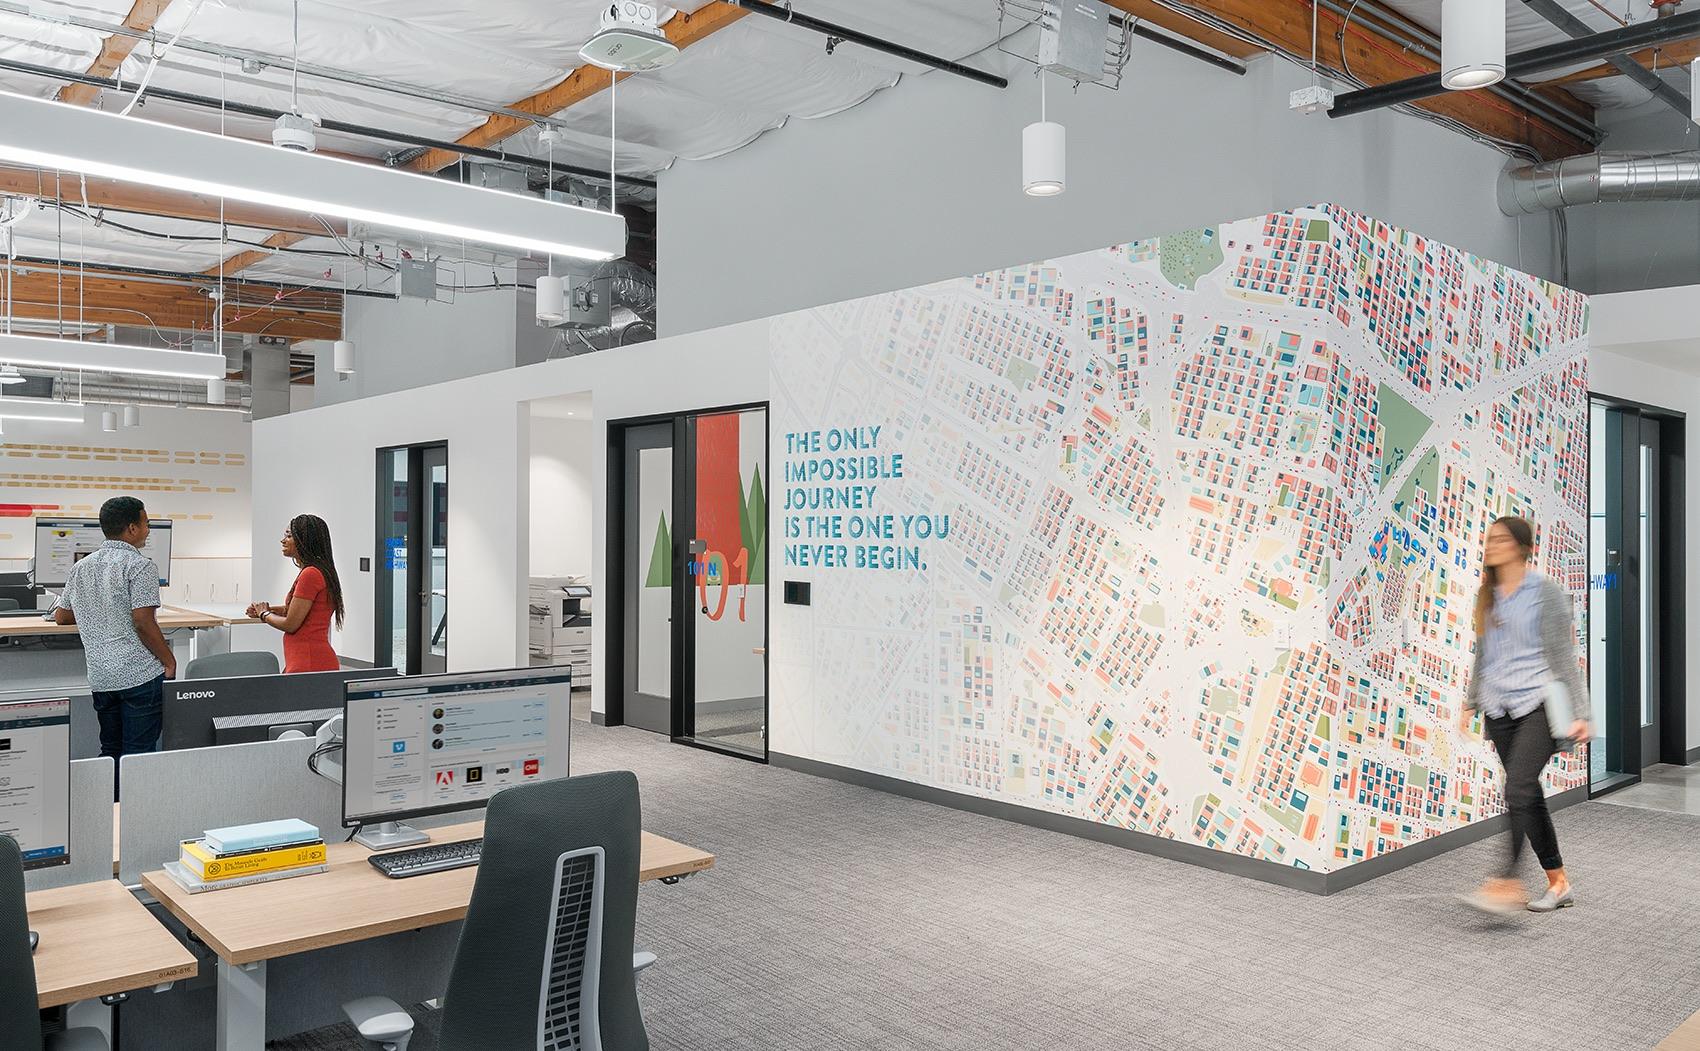 A Tour of LinkedIn's New Sunnyvale Office – 575 Building